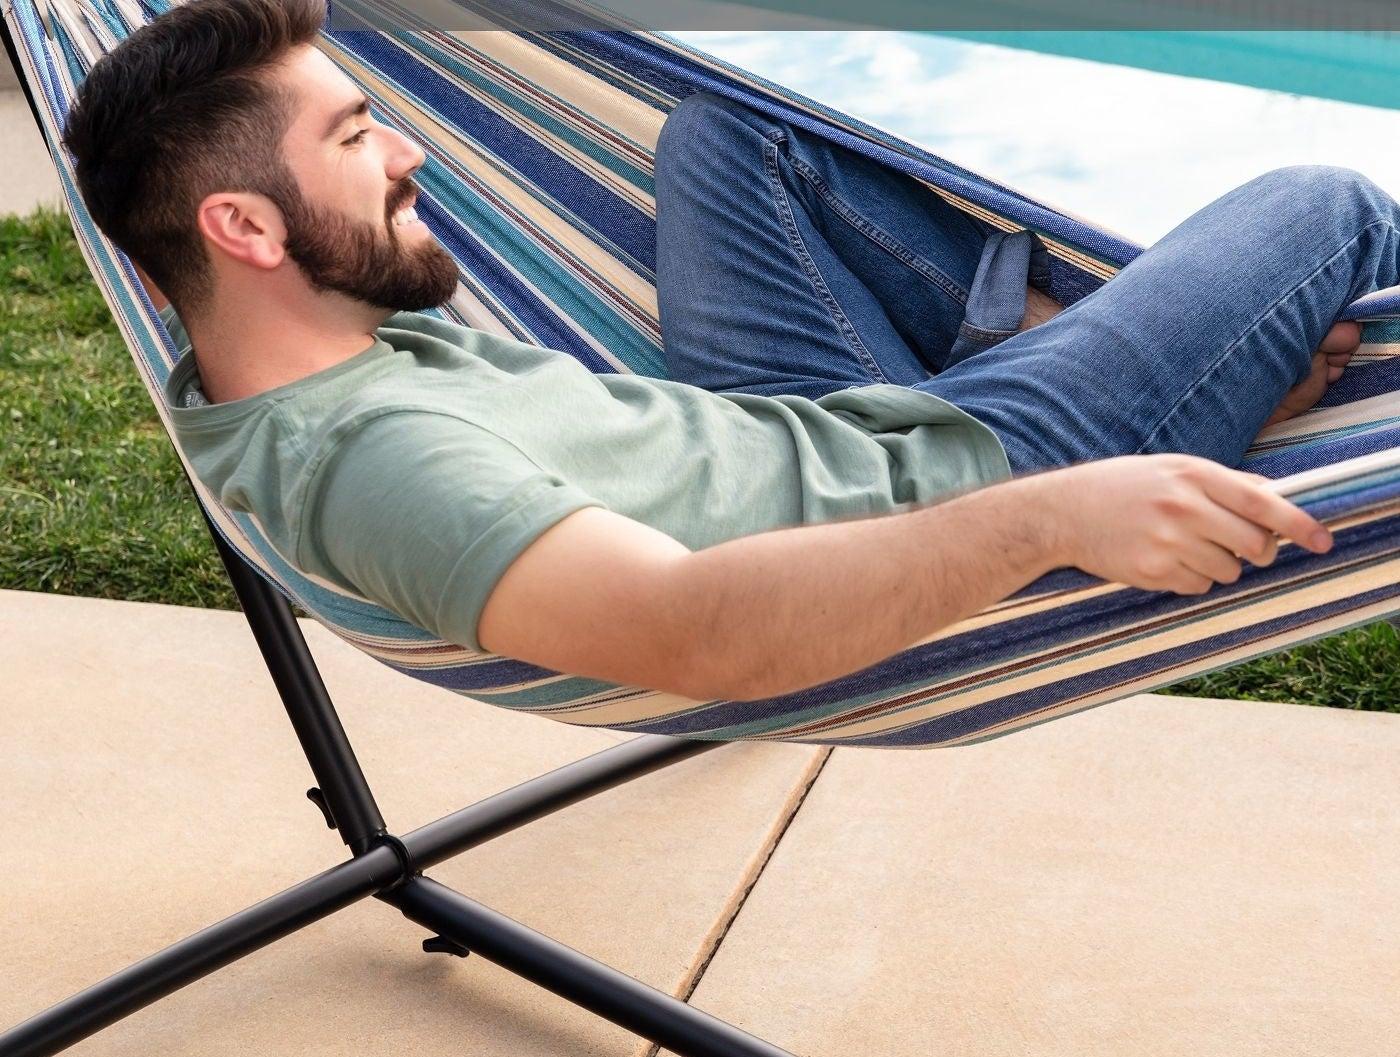 The ocean cotton double hammock